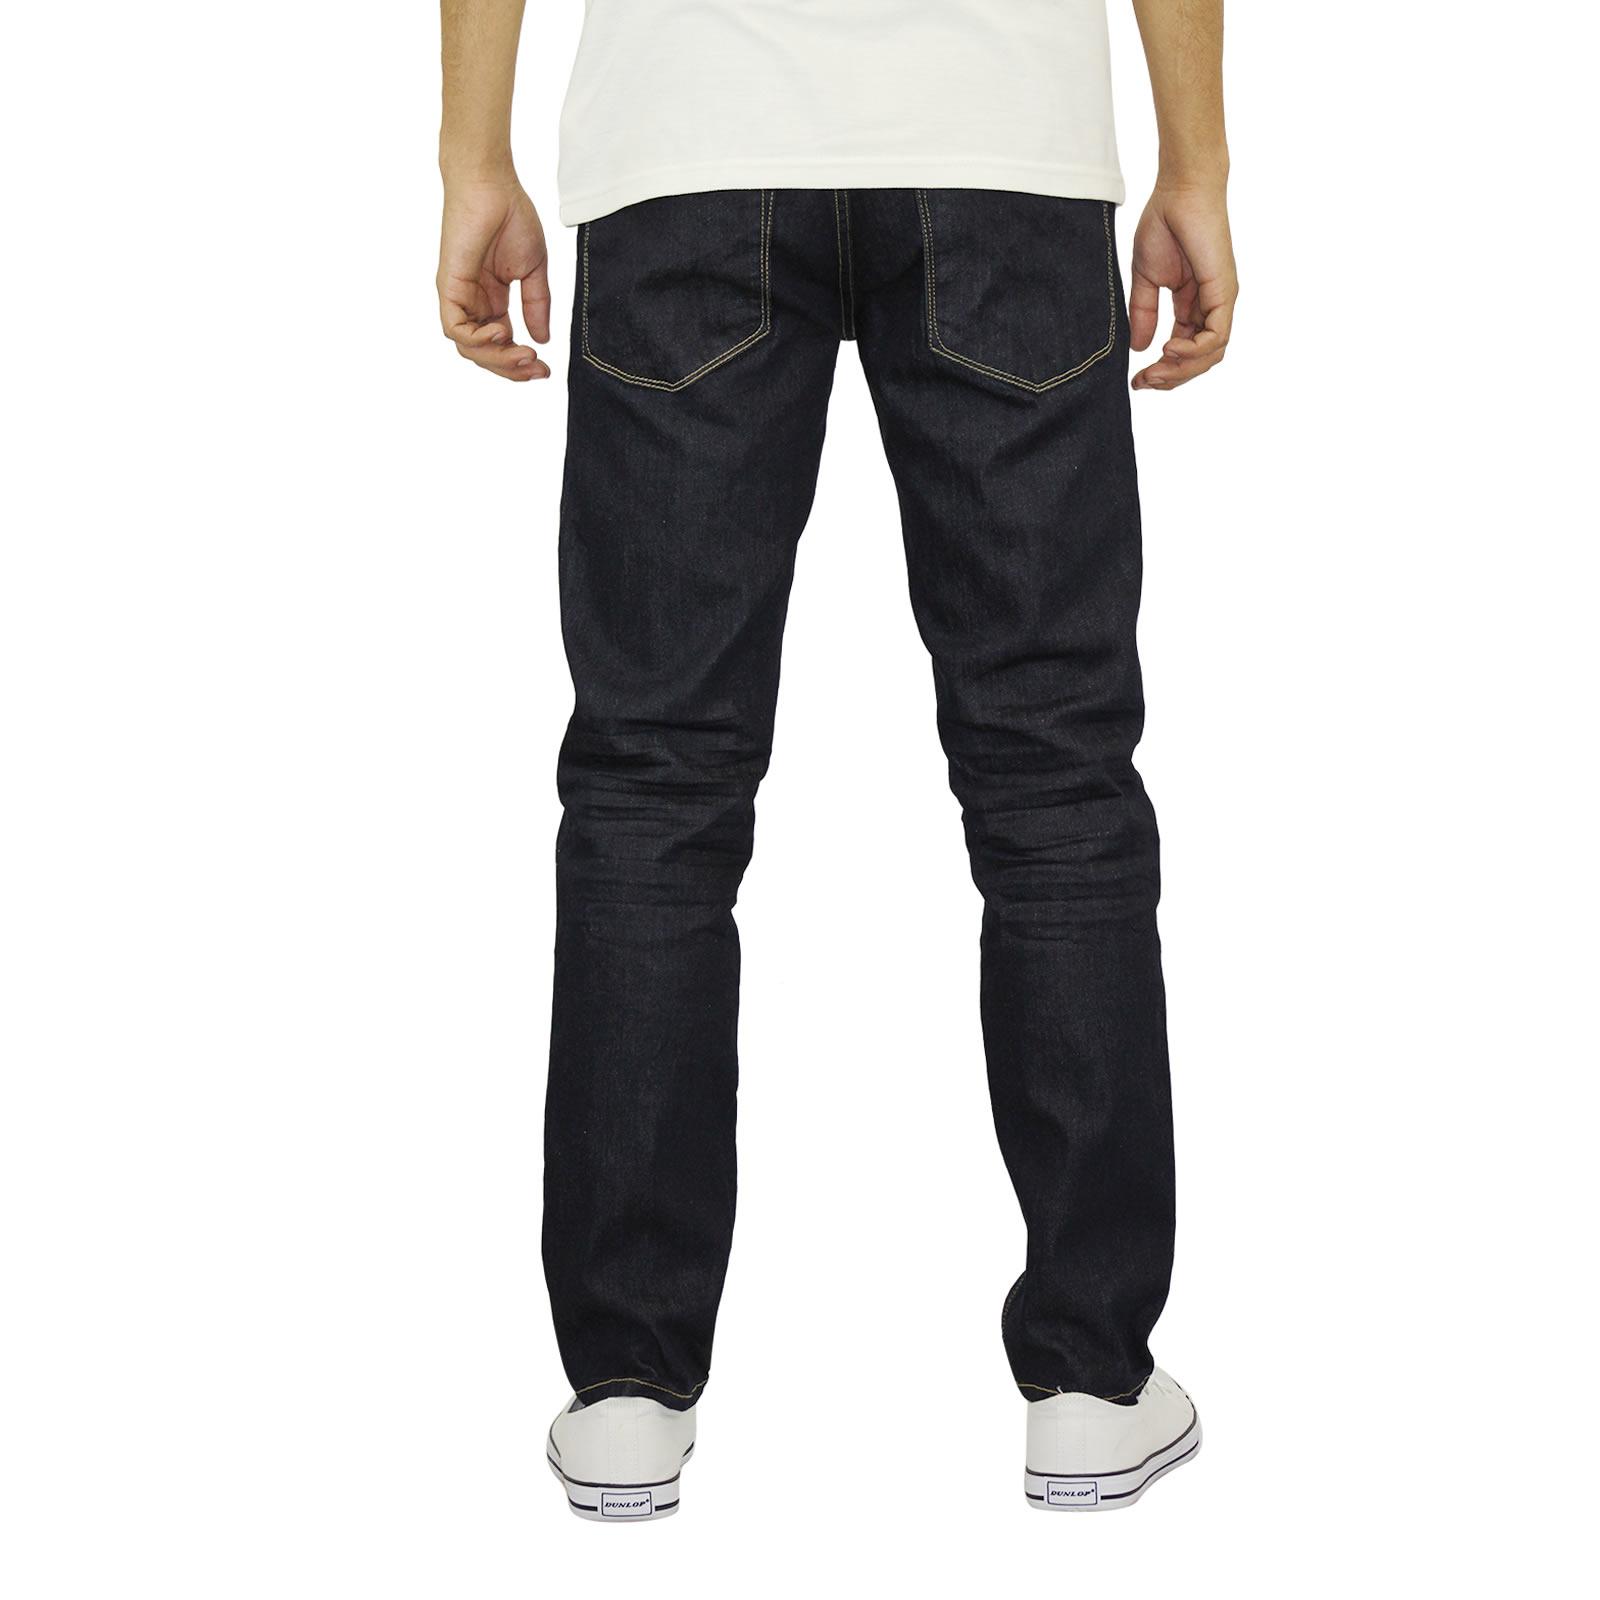 miniature 13 - Homme-Crosshatch-Jaco-Slim-Jeans-stretch-pantalon-denim-effet-vieilli